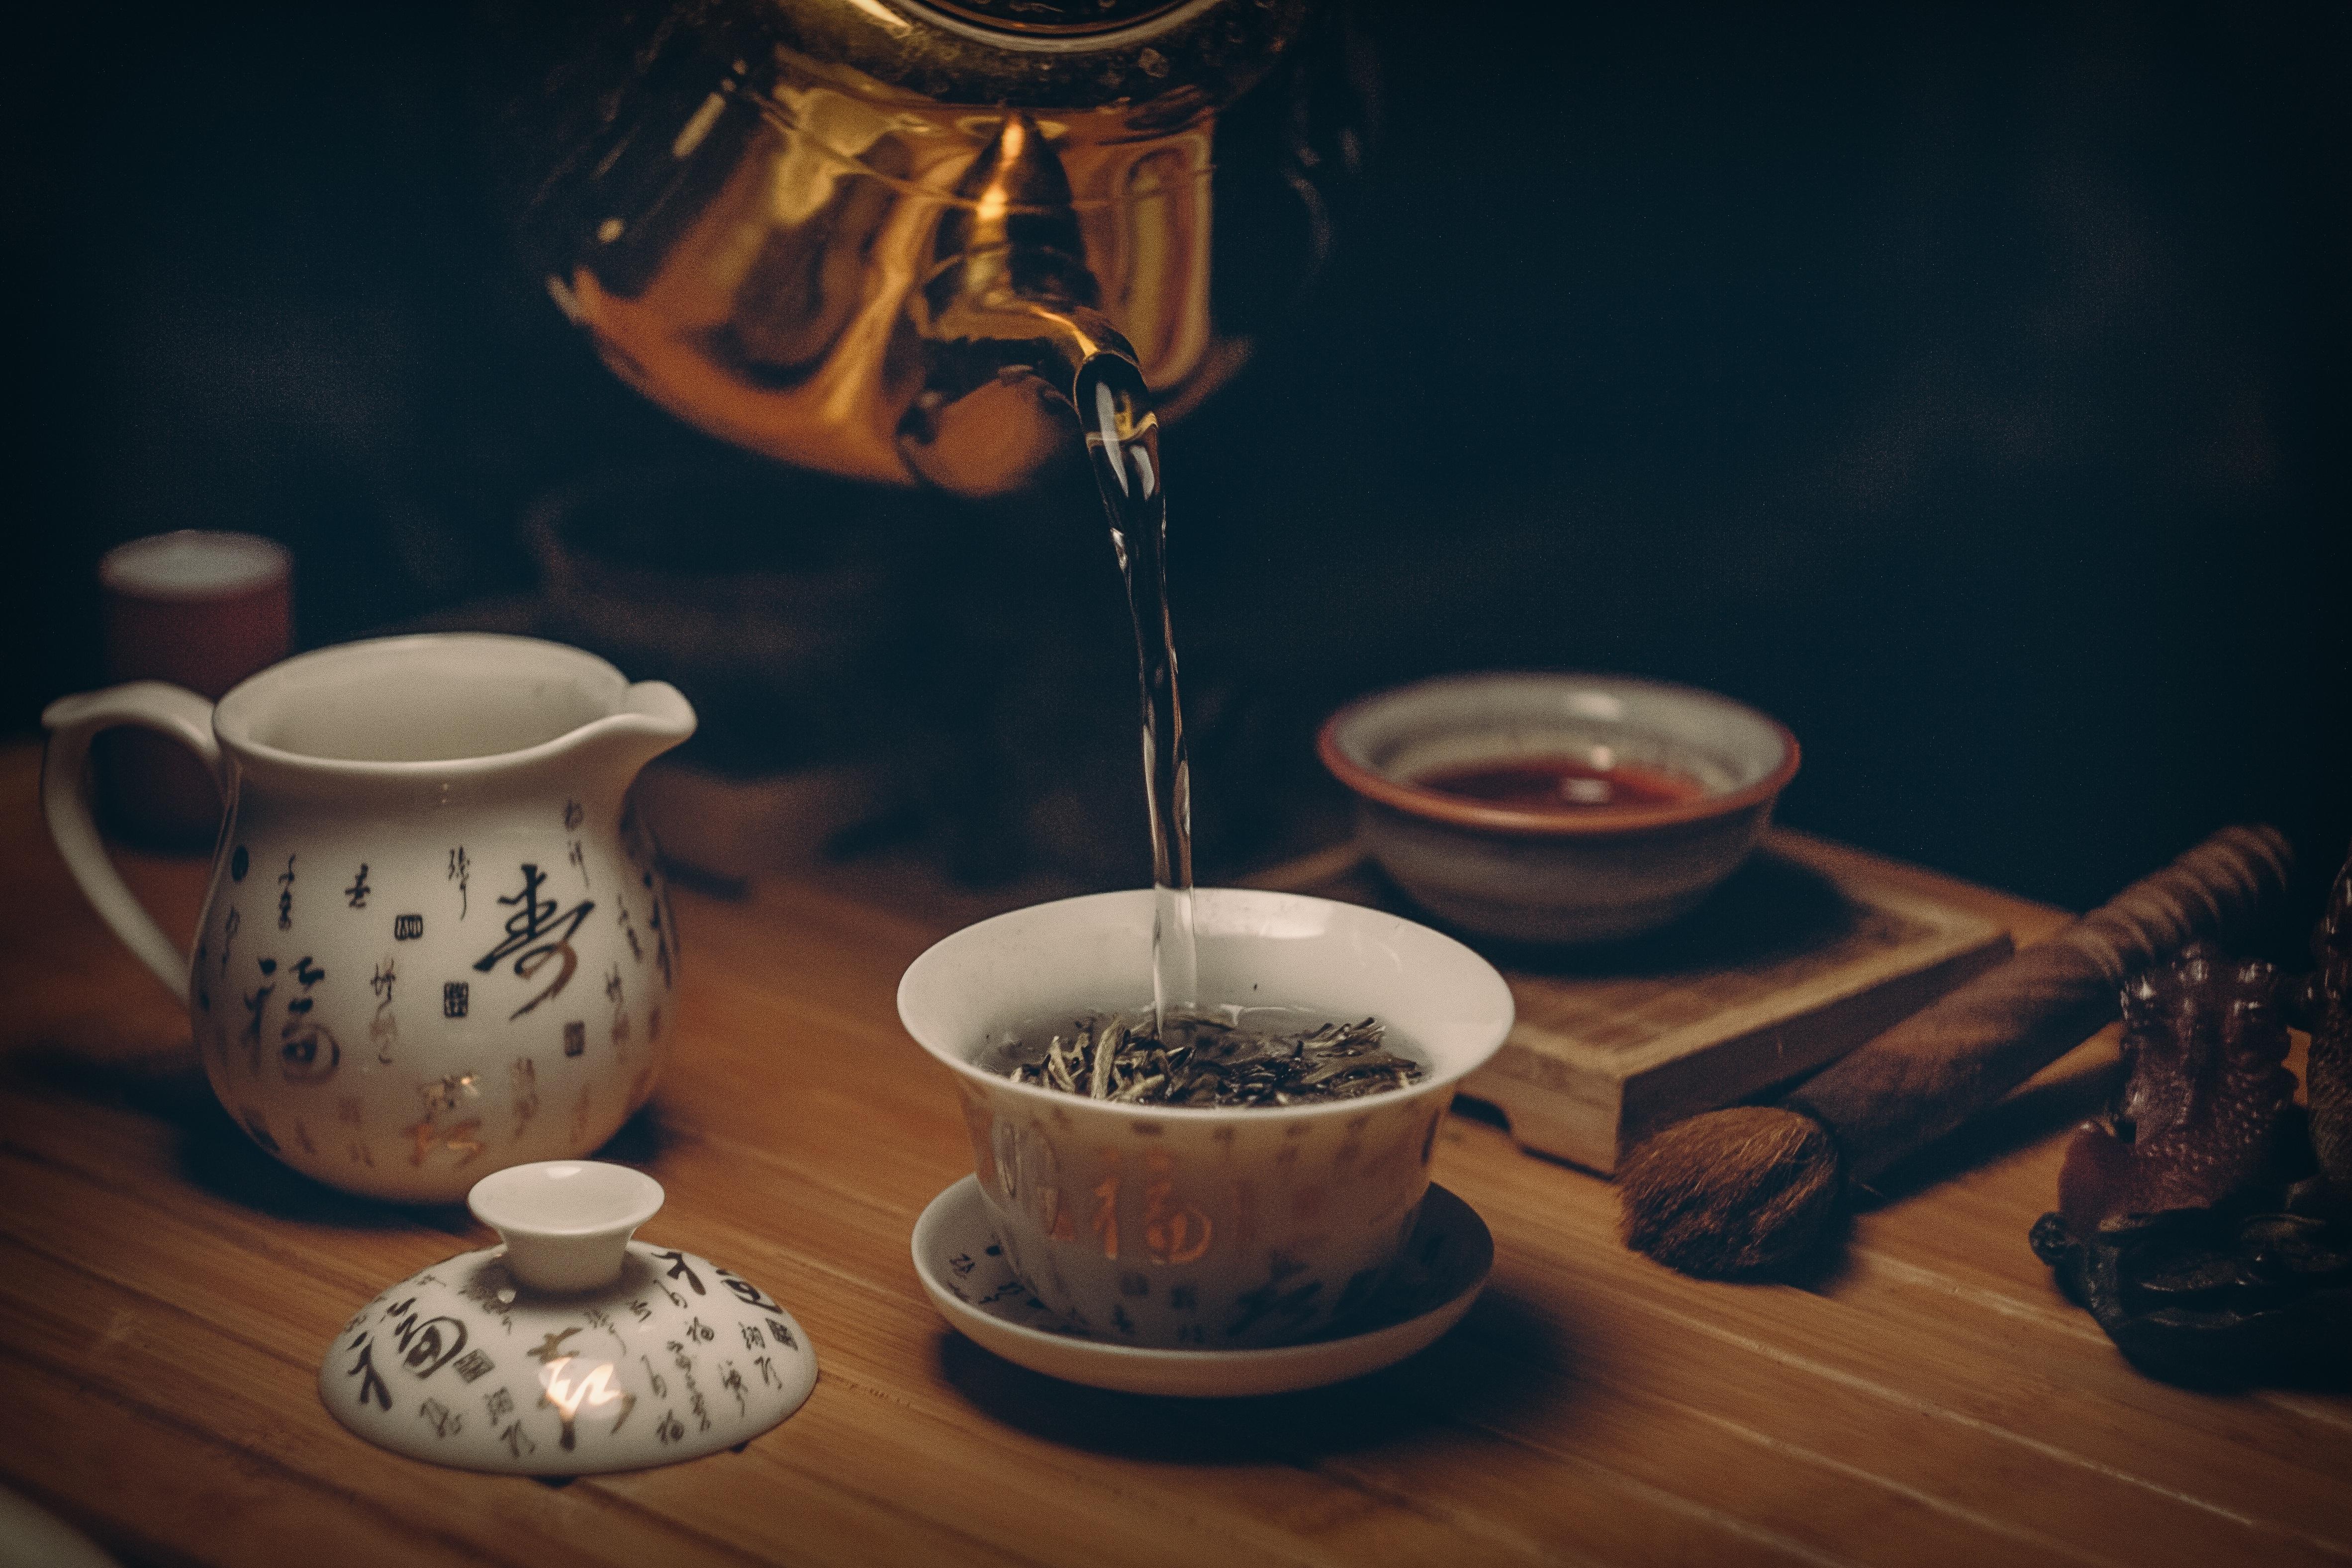 Gambar Meja Air Kayu Teko Makanan Lepek Keramik Minuman Minum Sarapan Penerangan Masih Hidup Barang Pecah Belah Alat Dapur Lukisan